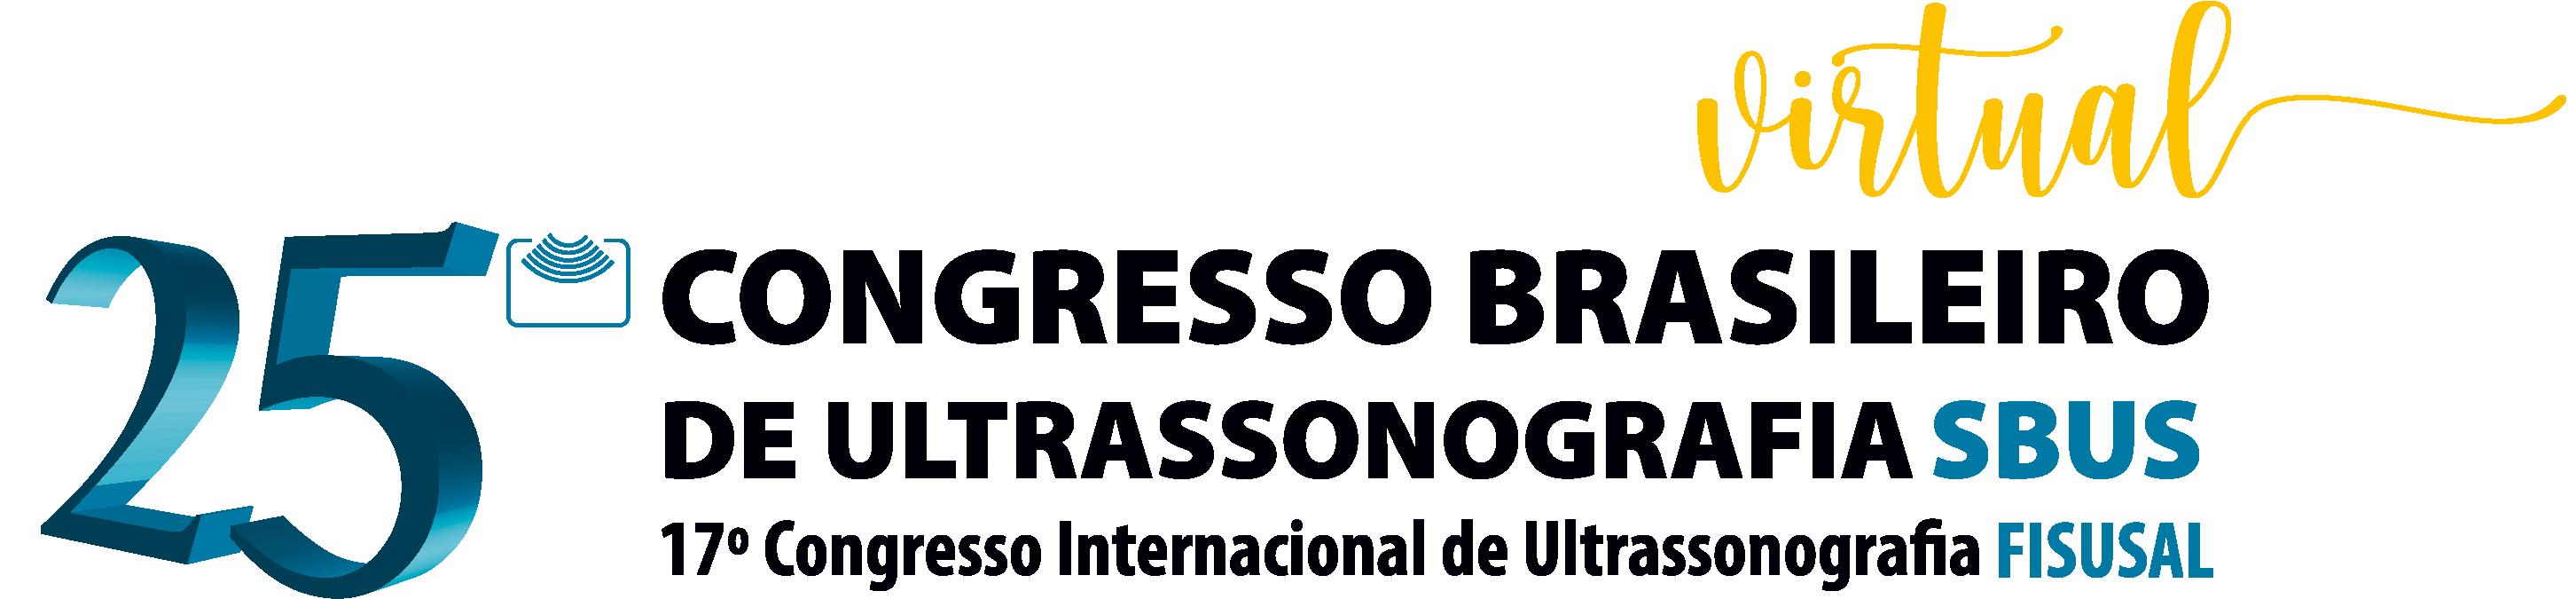 Congresso Brasileiro de Ultrassonografia SBUS e 17º Congresso Internacional de Ultrassonografia FISUSAL |  2021